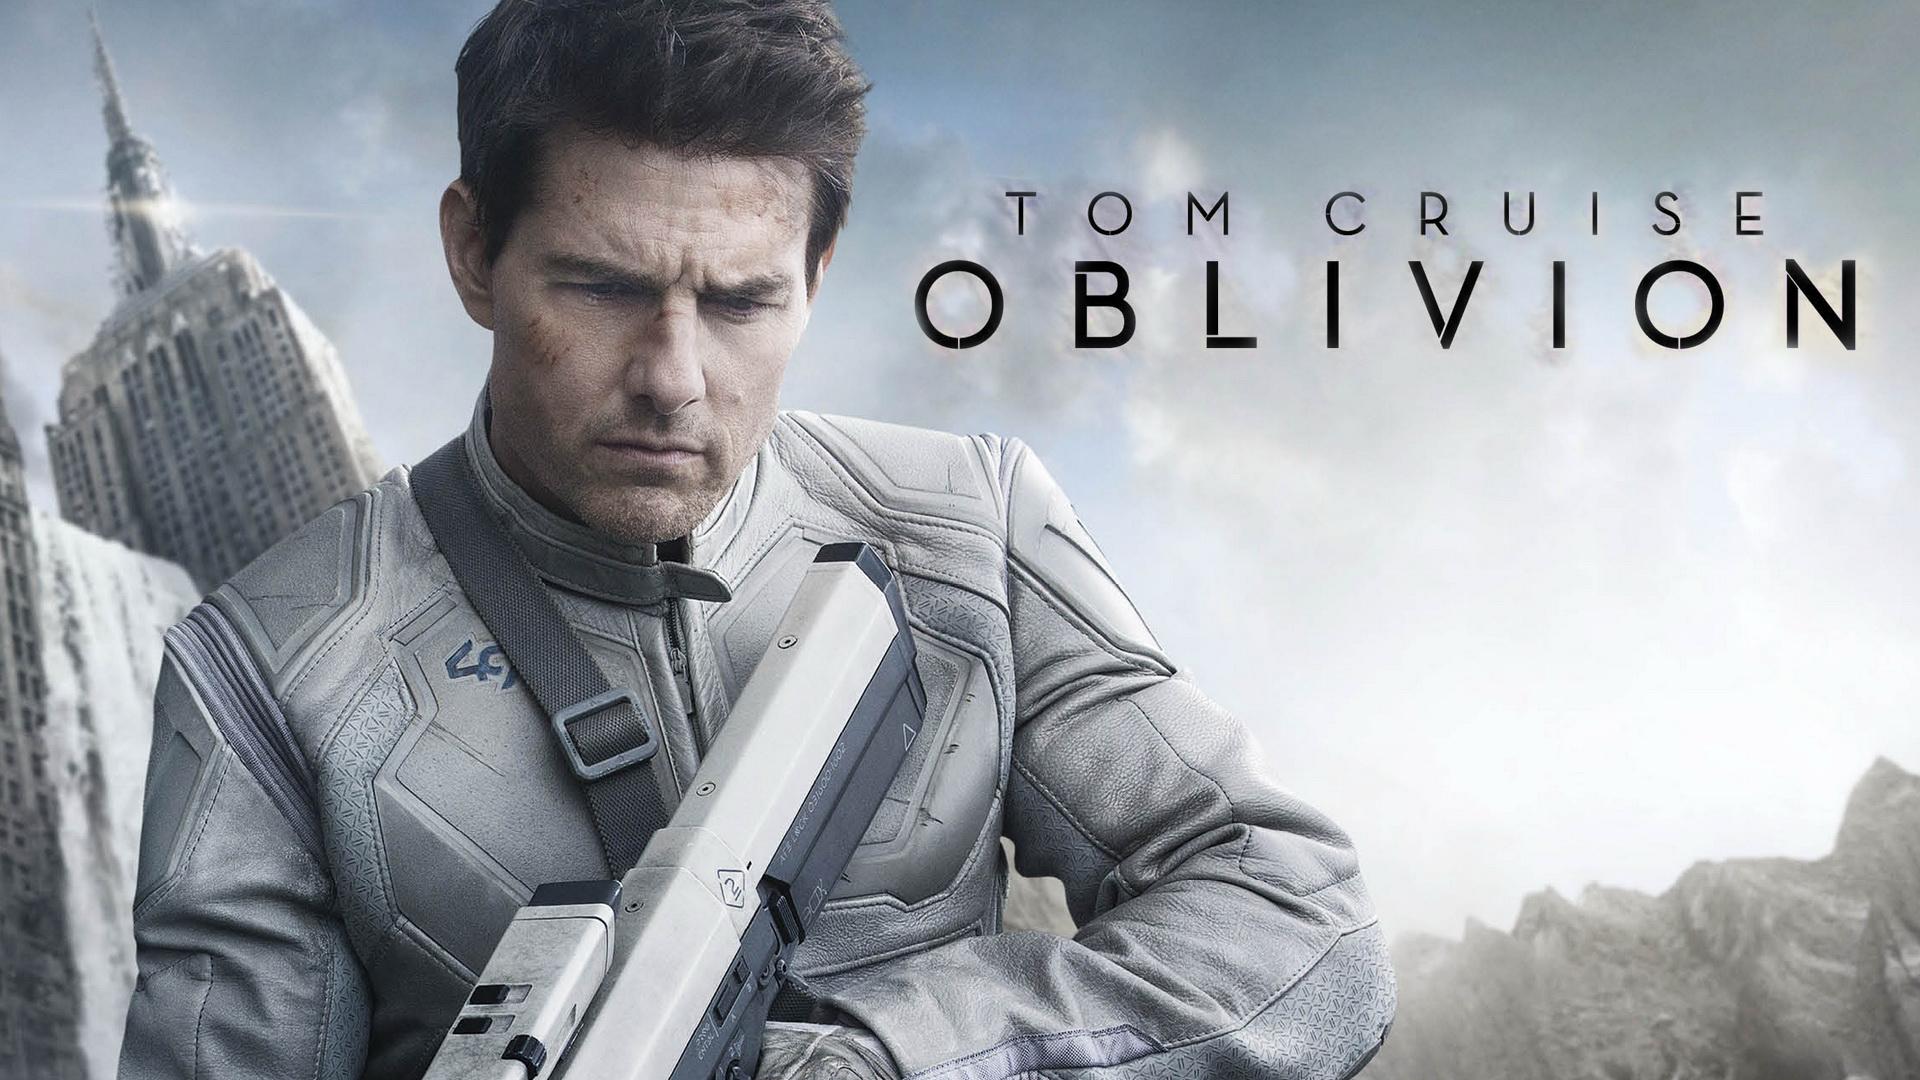 Tom Cruise Oblivion 7016917 1920x1080